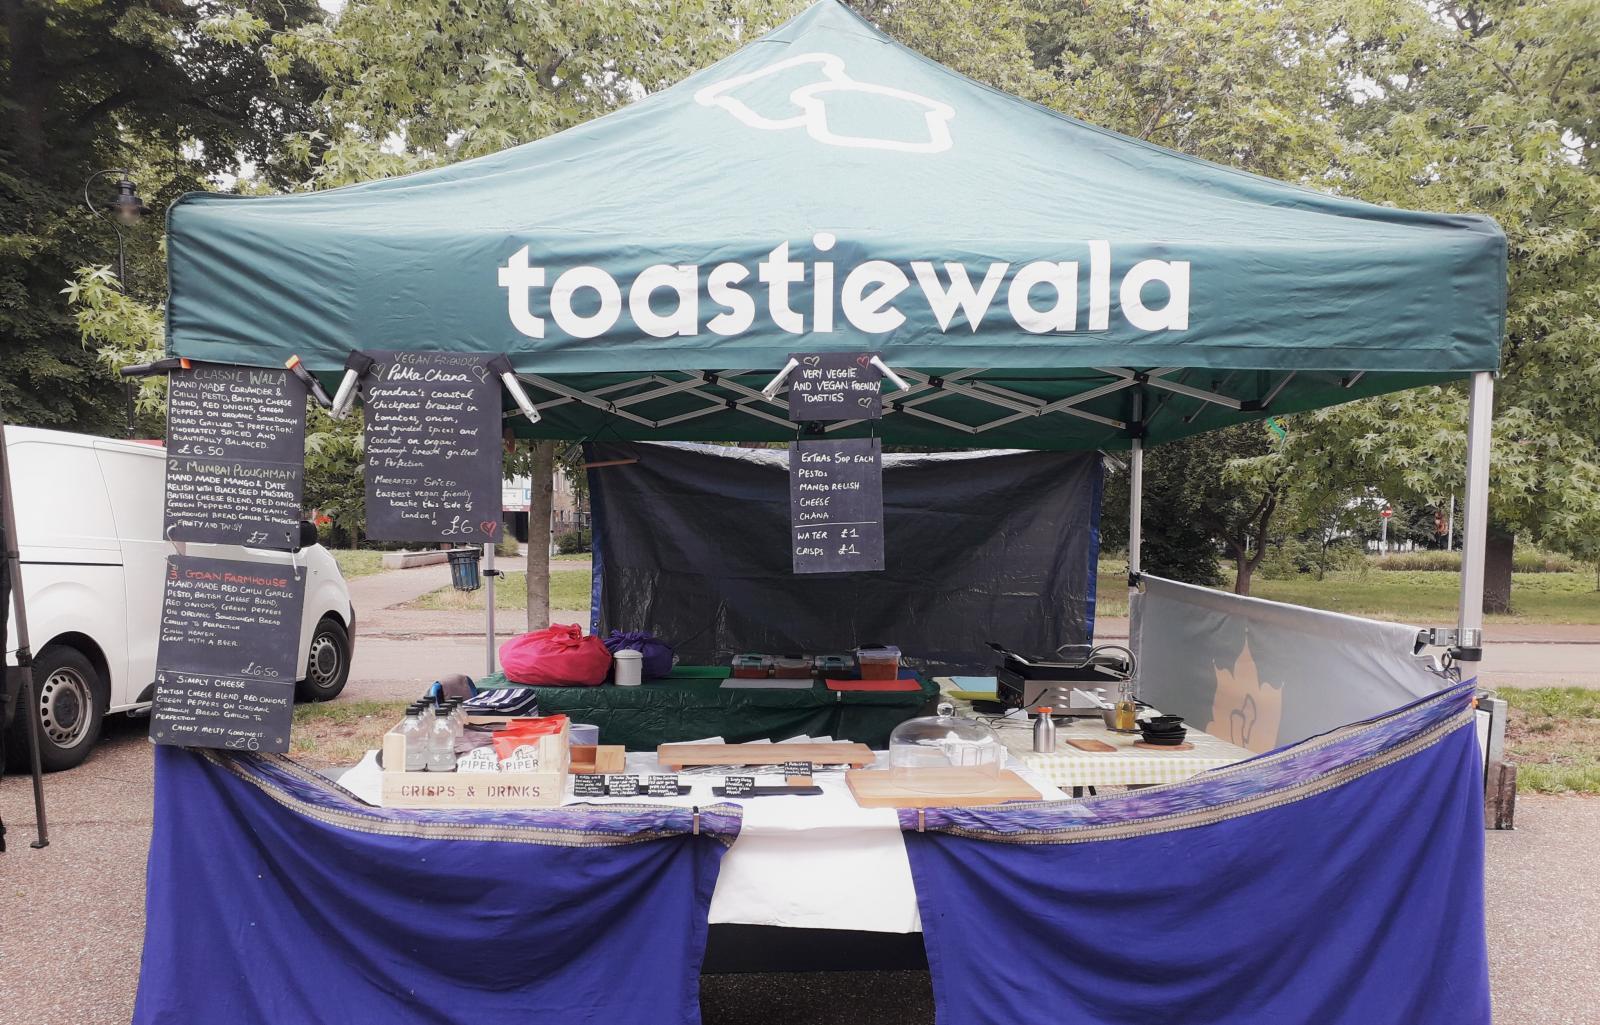 Toastiewala's market stall, taken by Farah Ebrahem